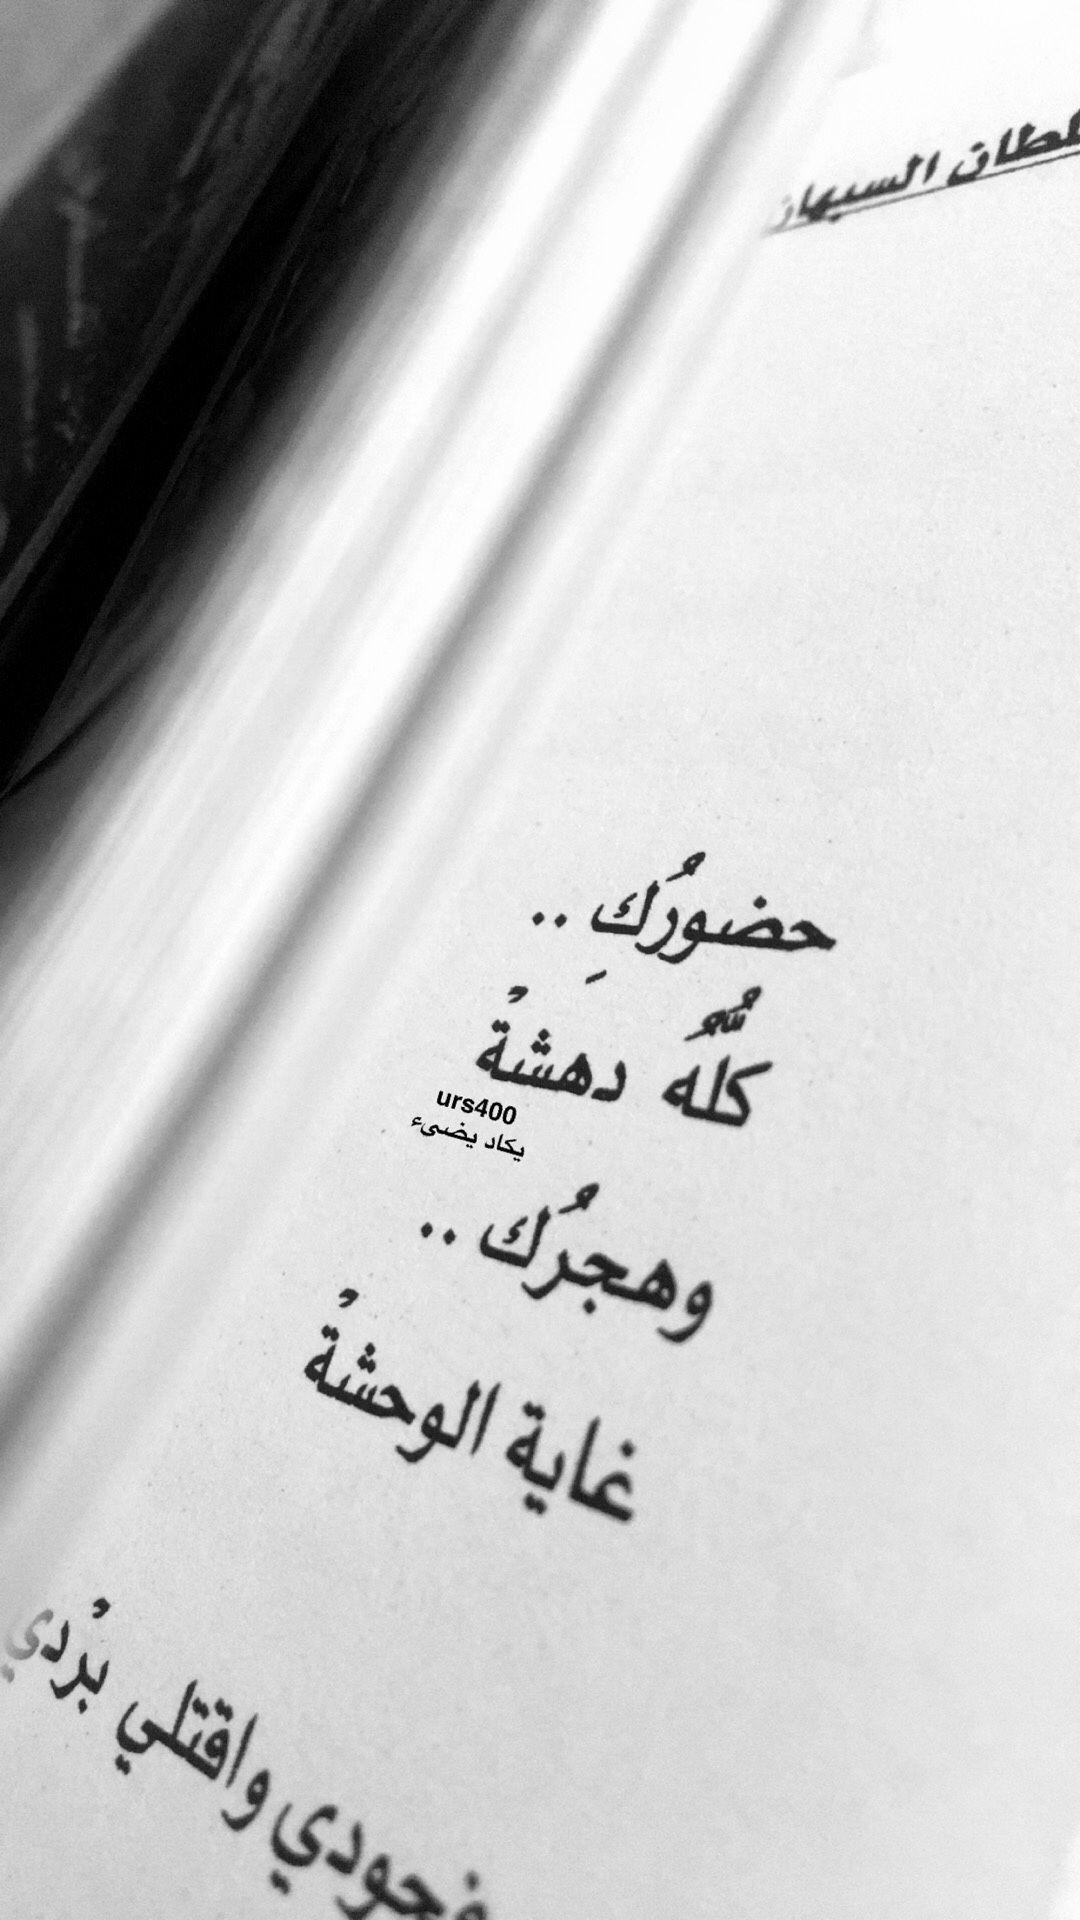 سناب انستغرام Urs400 Inspirational Quotes Quotes Arabic Quotes